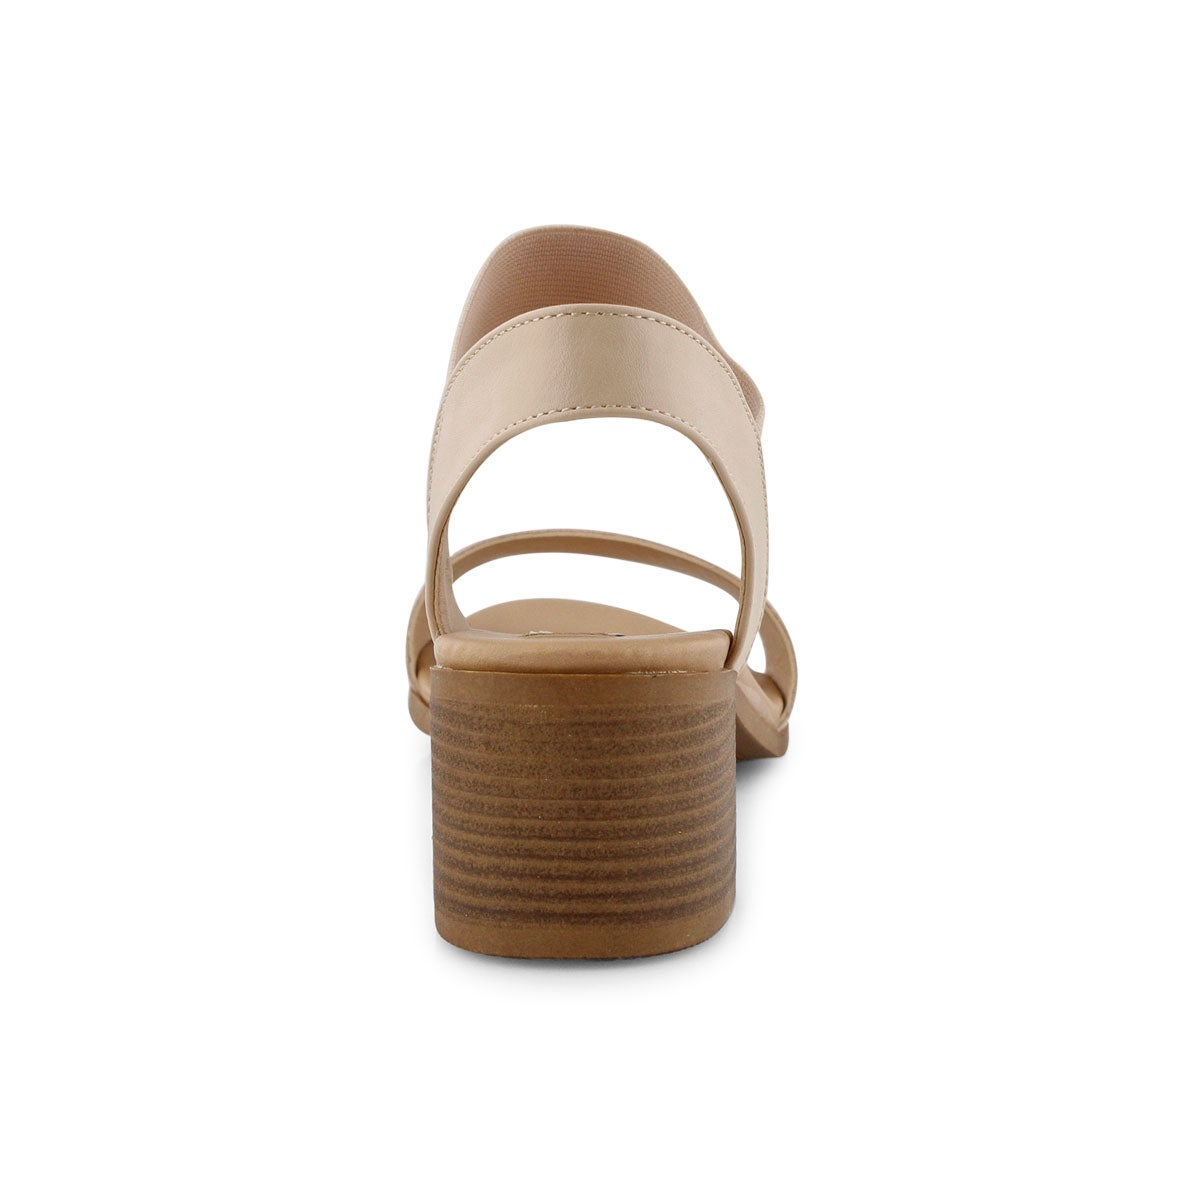 Lds Azzie blush wedge sandal